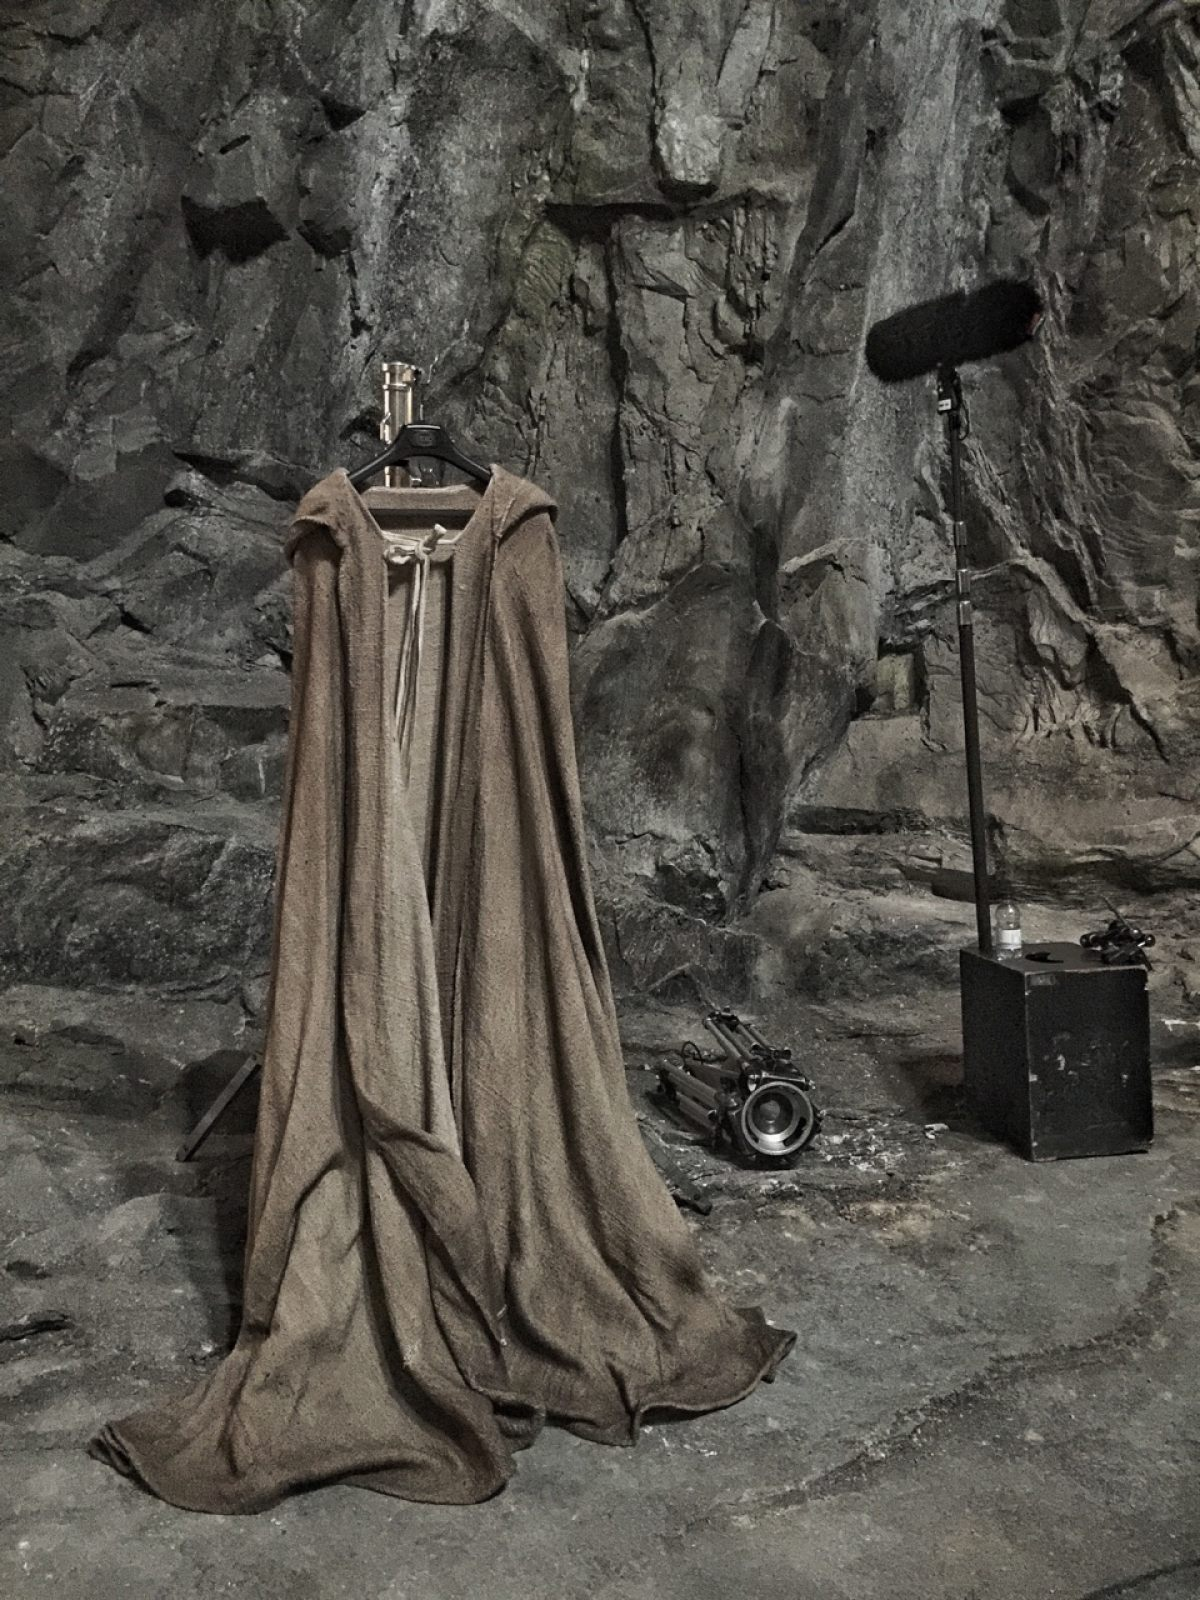 Star Wars Episode VIII robe set photo by Rian Johnson